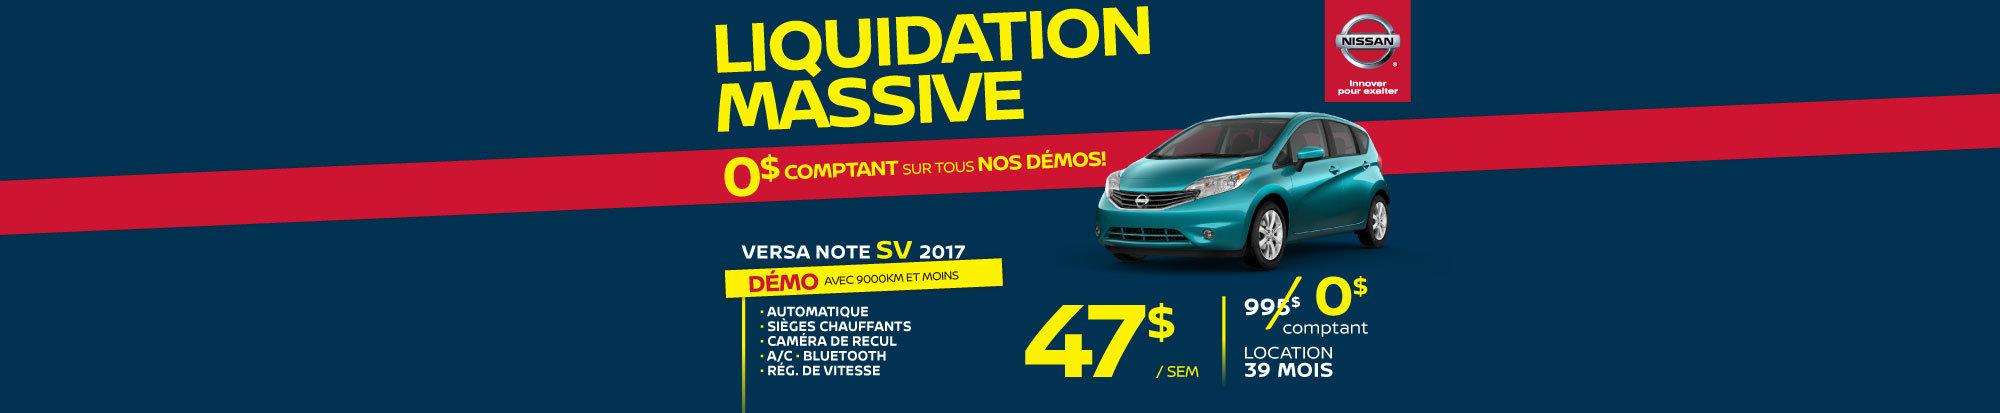 Liquidation massive Versa Note SV web